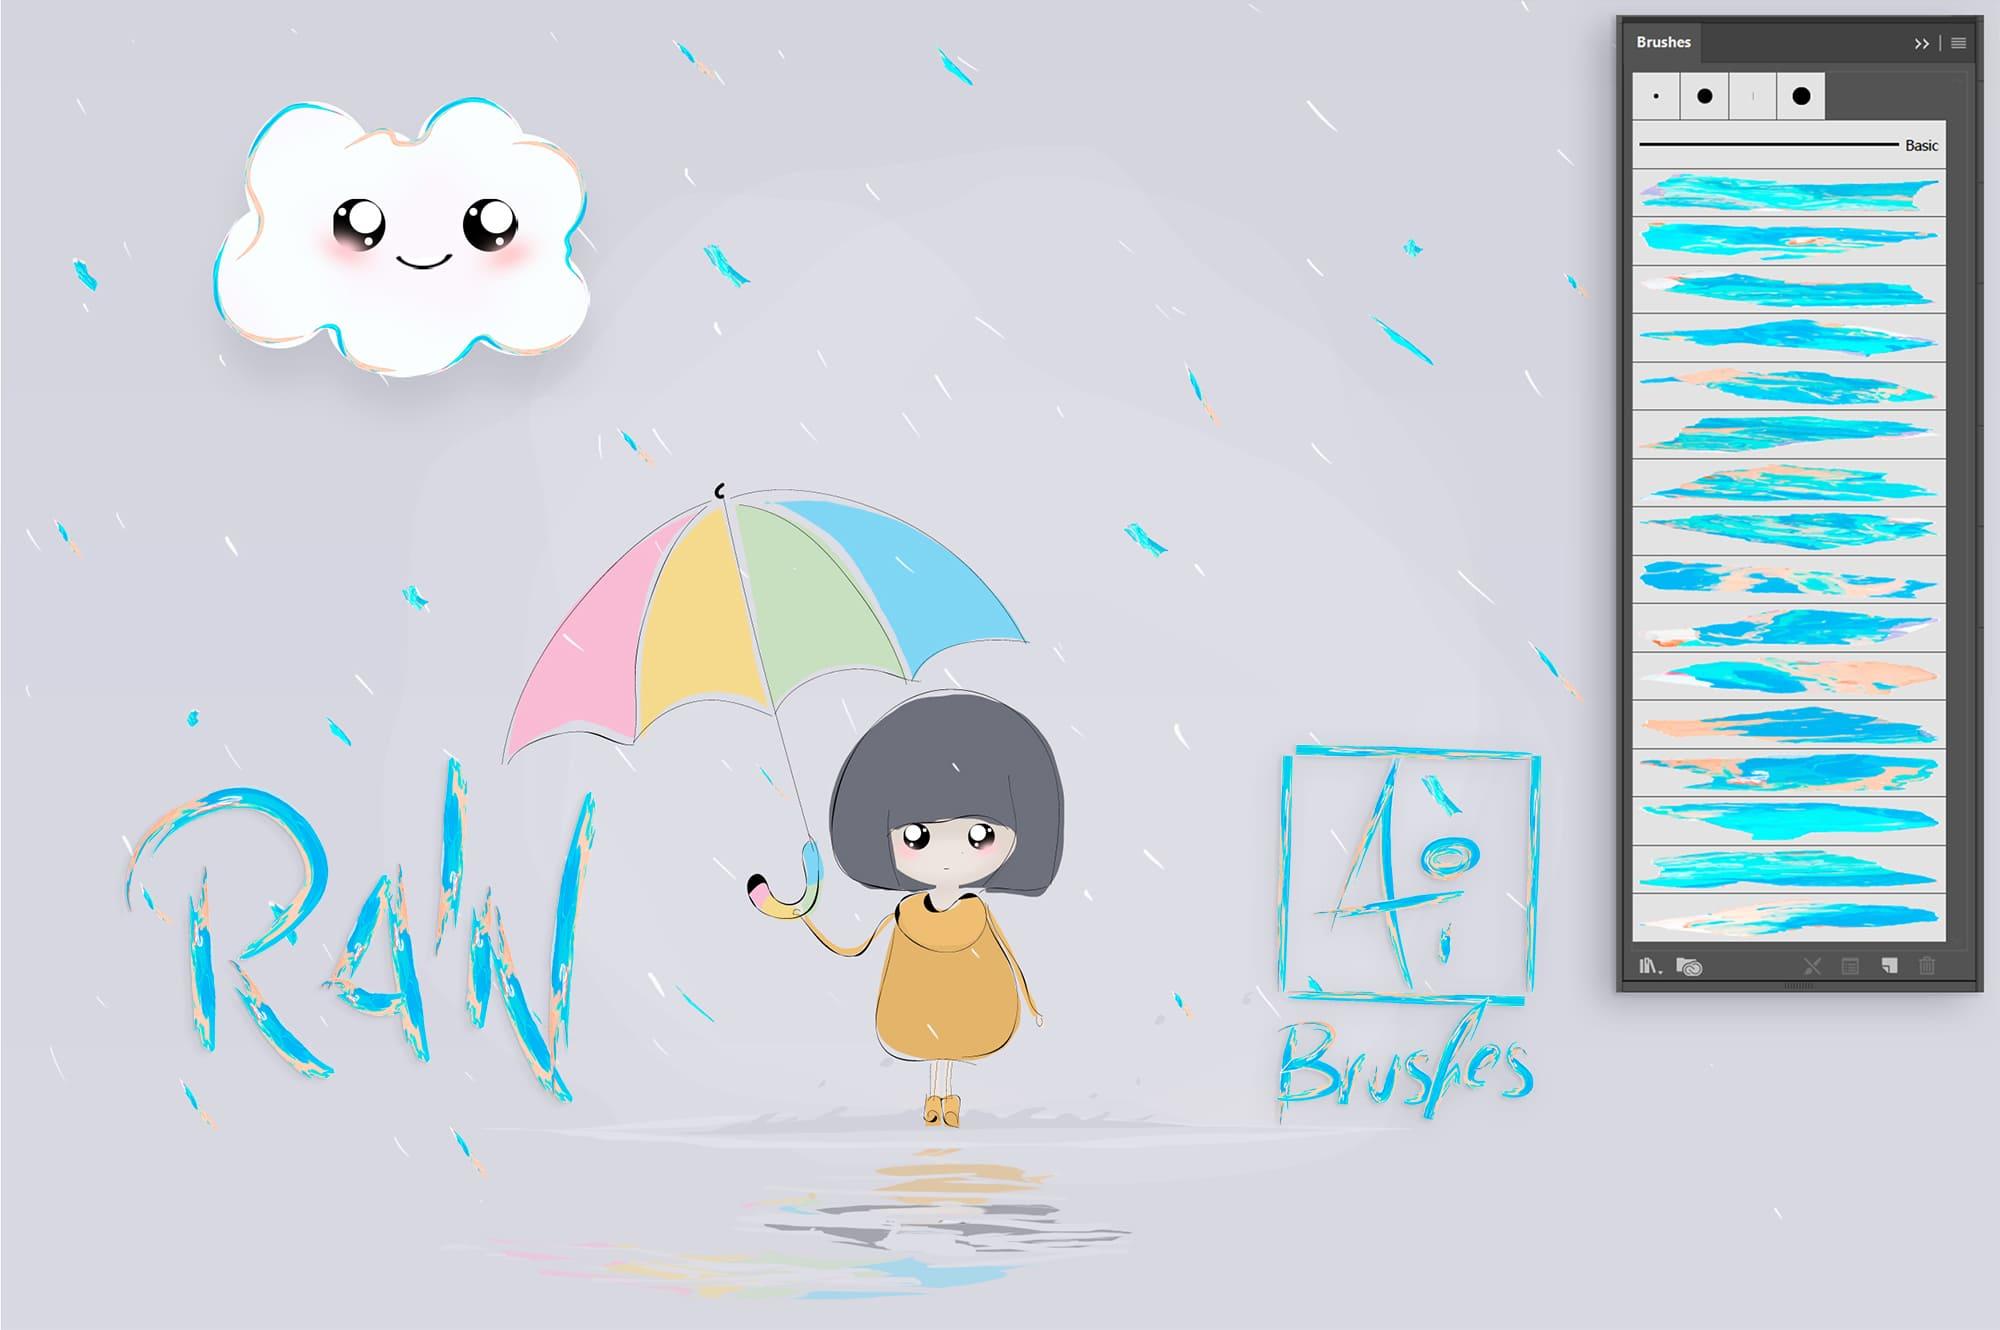 Girl in the rain with a colored umbrella.